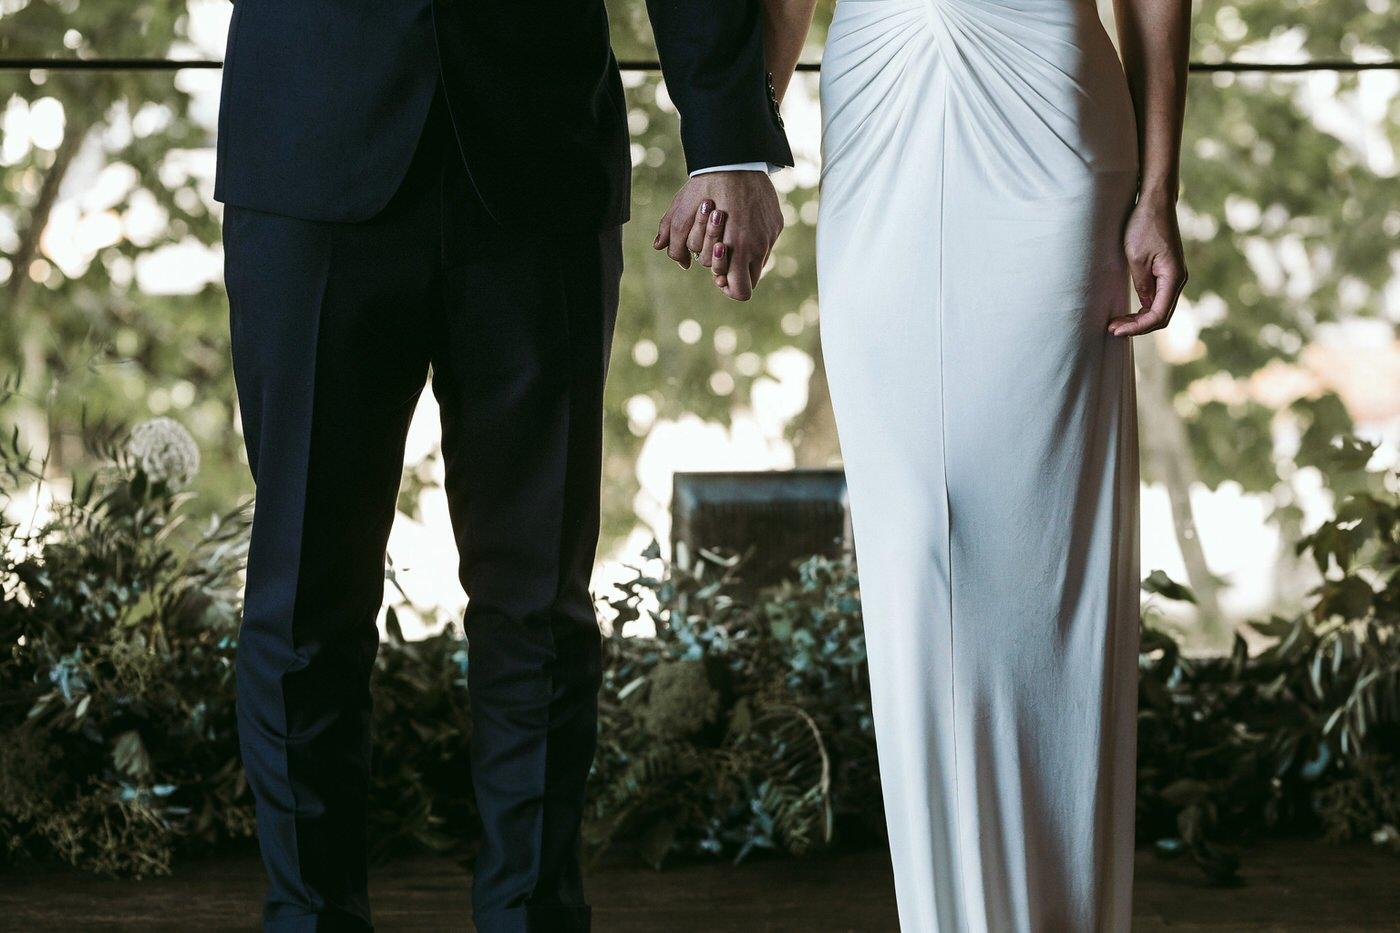 GoldandGrit_KimMatt_Panama-Dining-Room-Fitzroy-Collingwood-Relaxed-Fun-Candid-Wedding-Photography_77.jpg